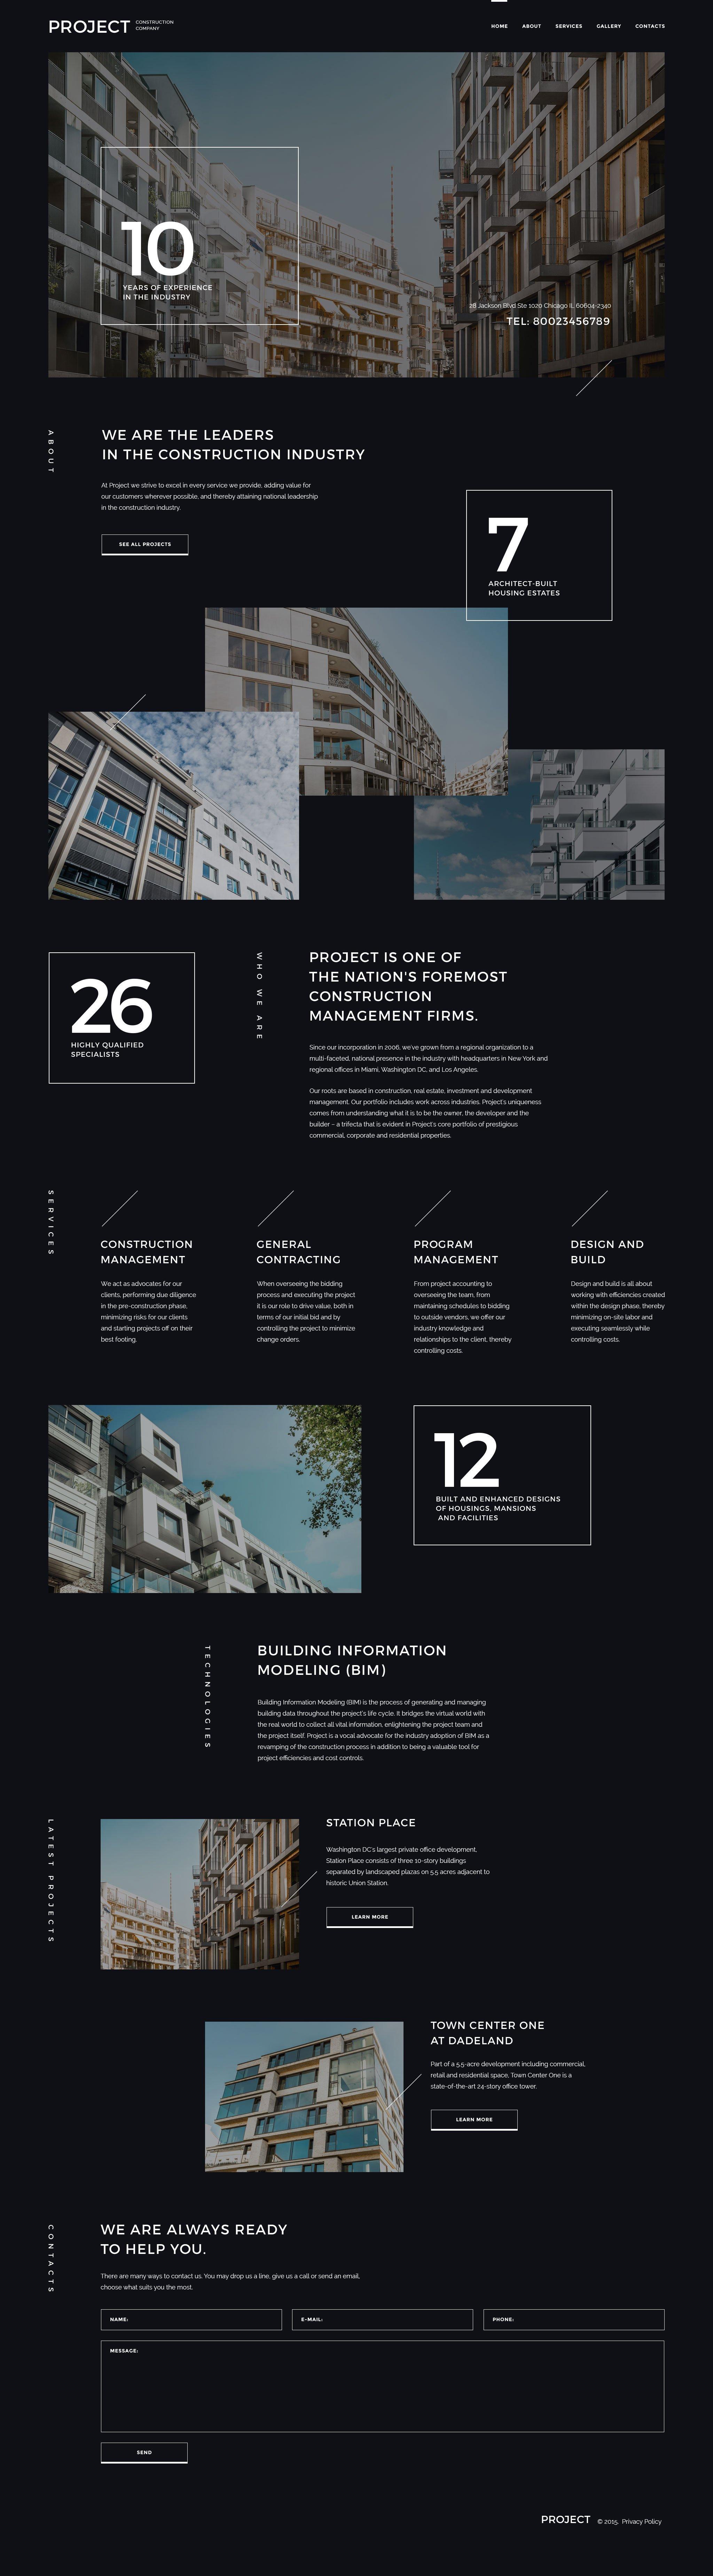 Project Construction Company Template Web №57947 - screenshot